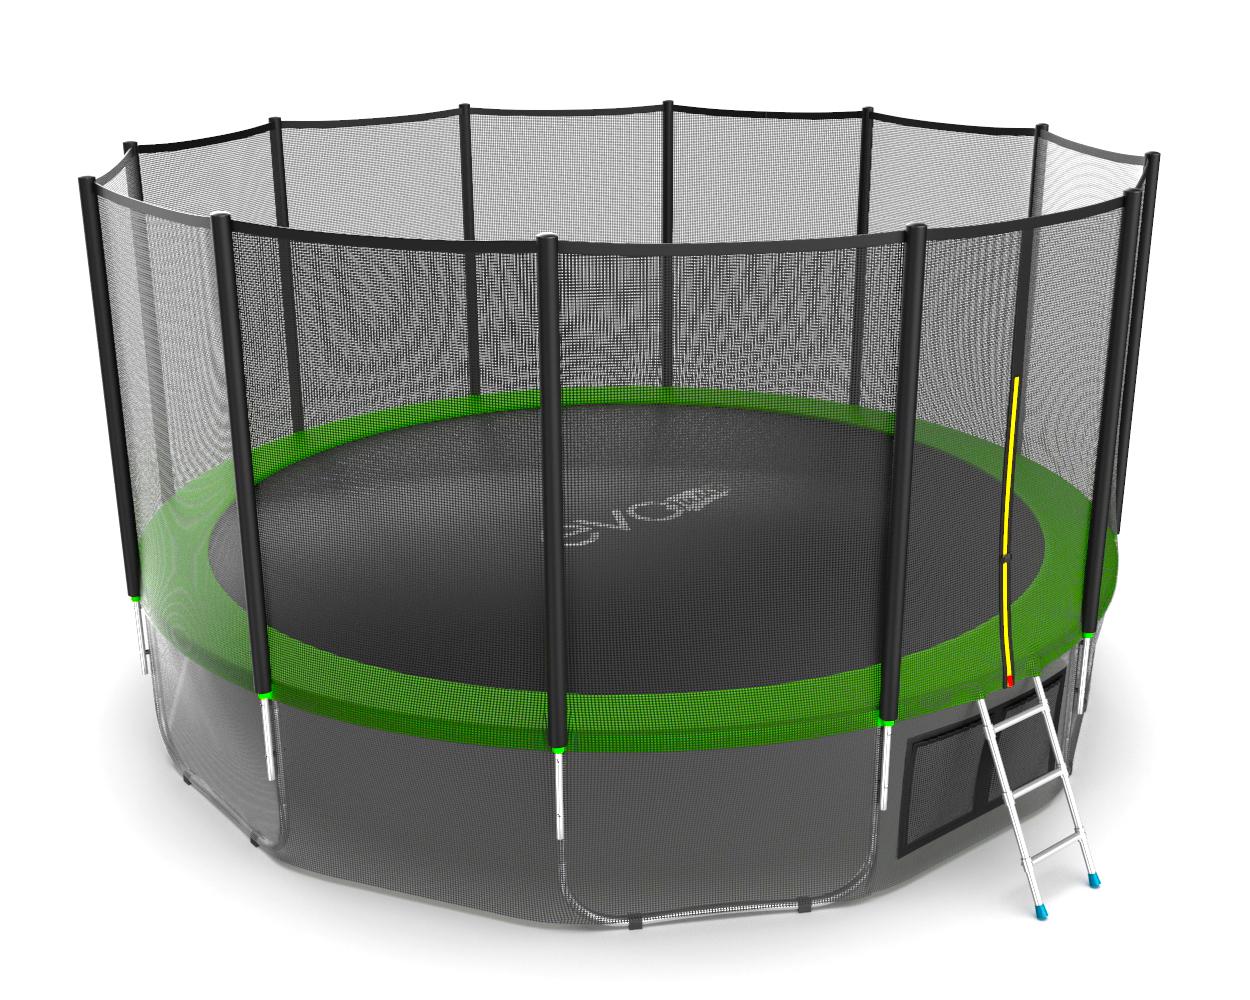 Батут с внутренней сеткой и лестницей EVO JUMP External 16ft (Green) + Lower net